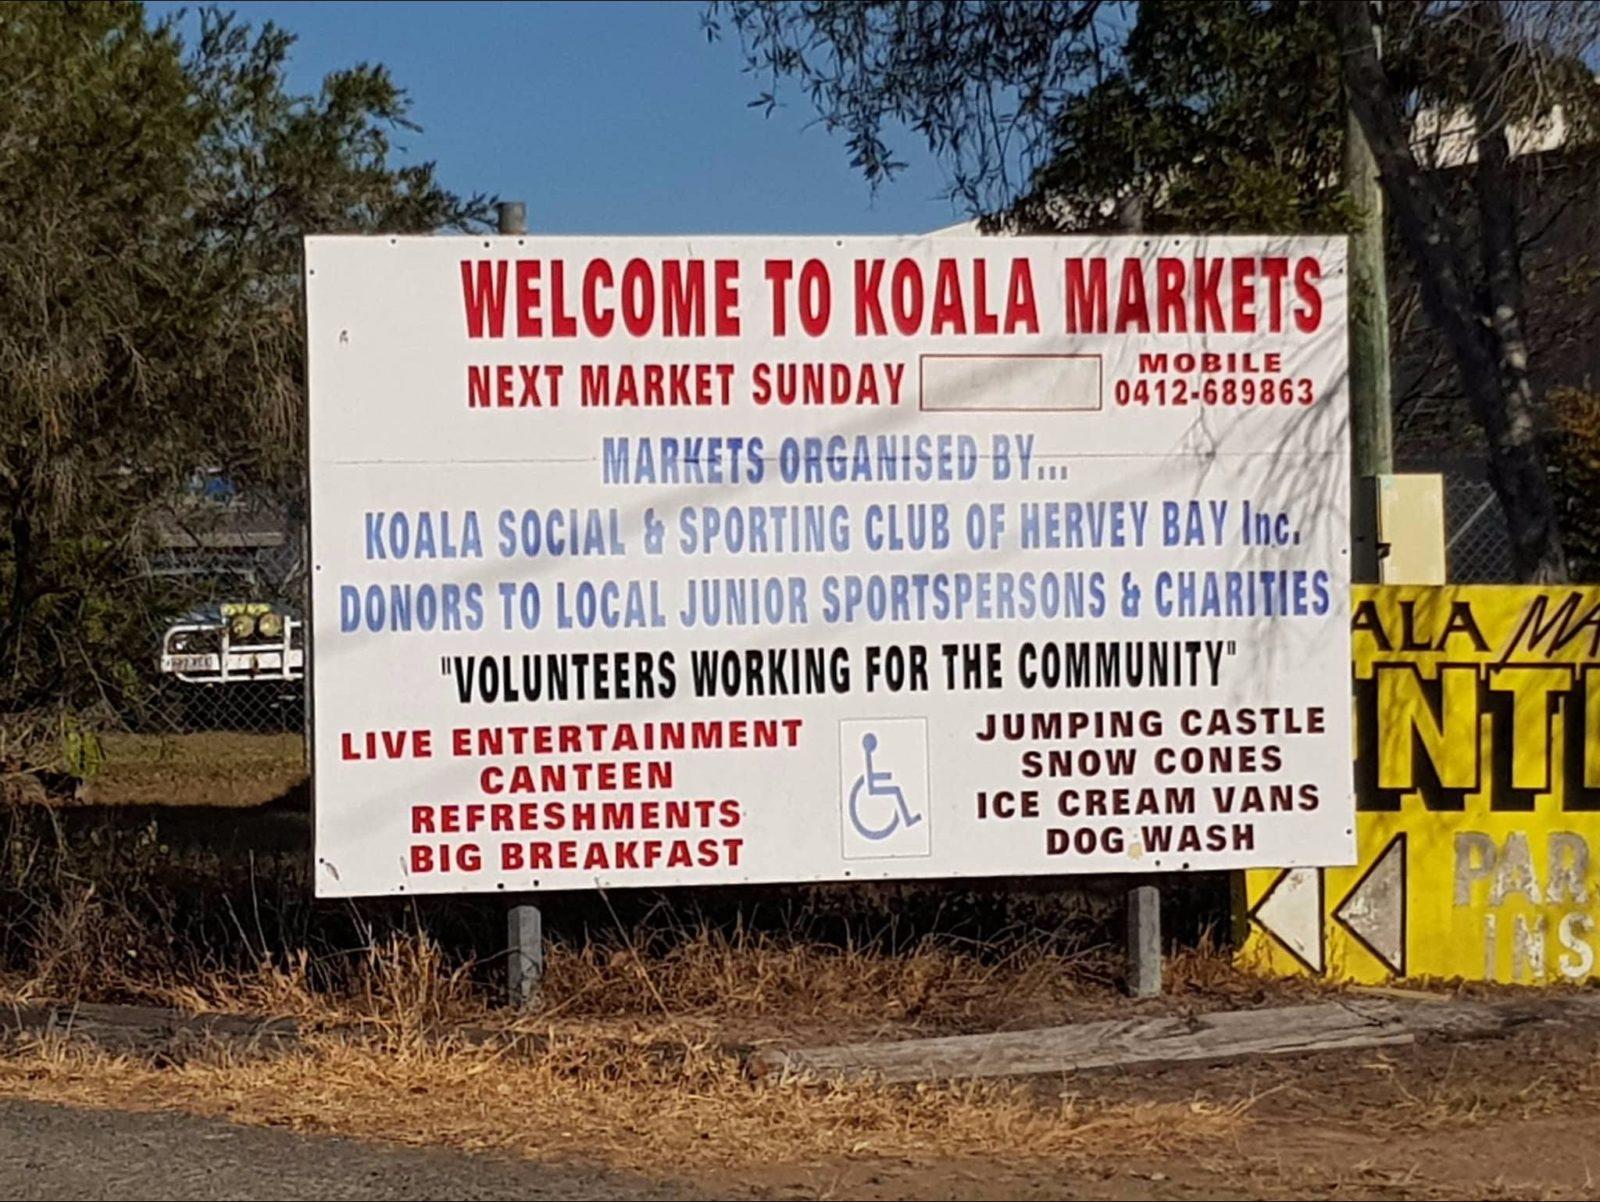 Koala markets